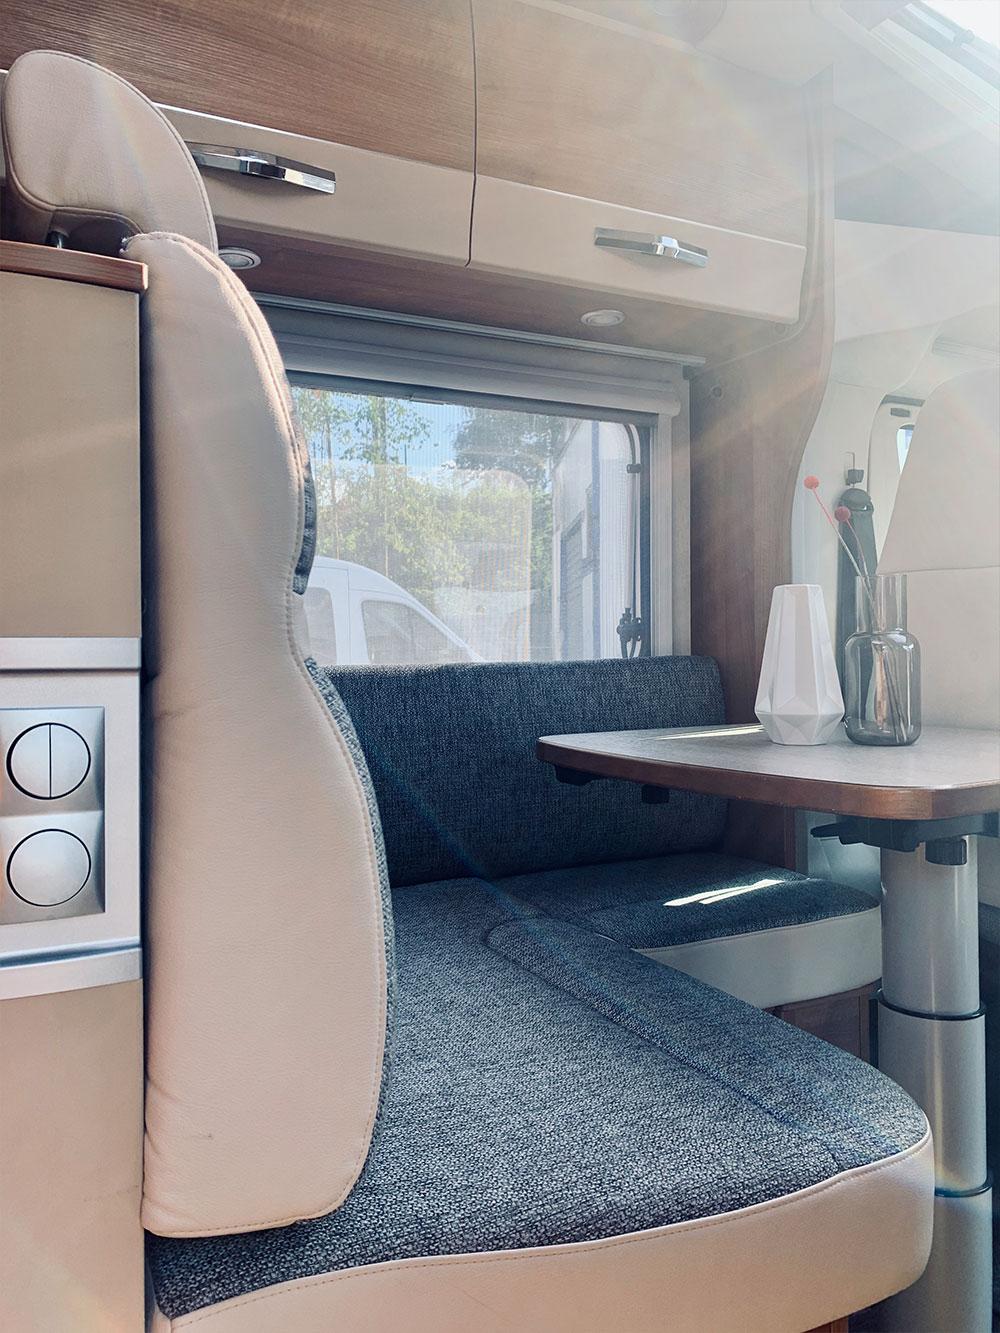 caravan mieten dortmund - Wohnmobil mieten Dortmund